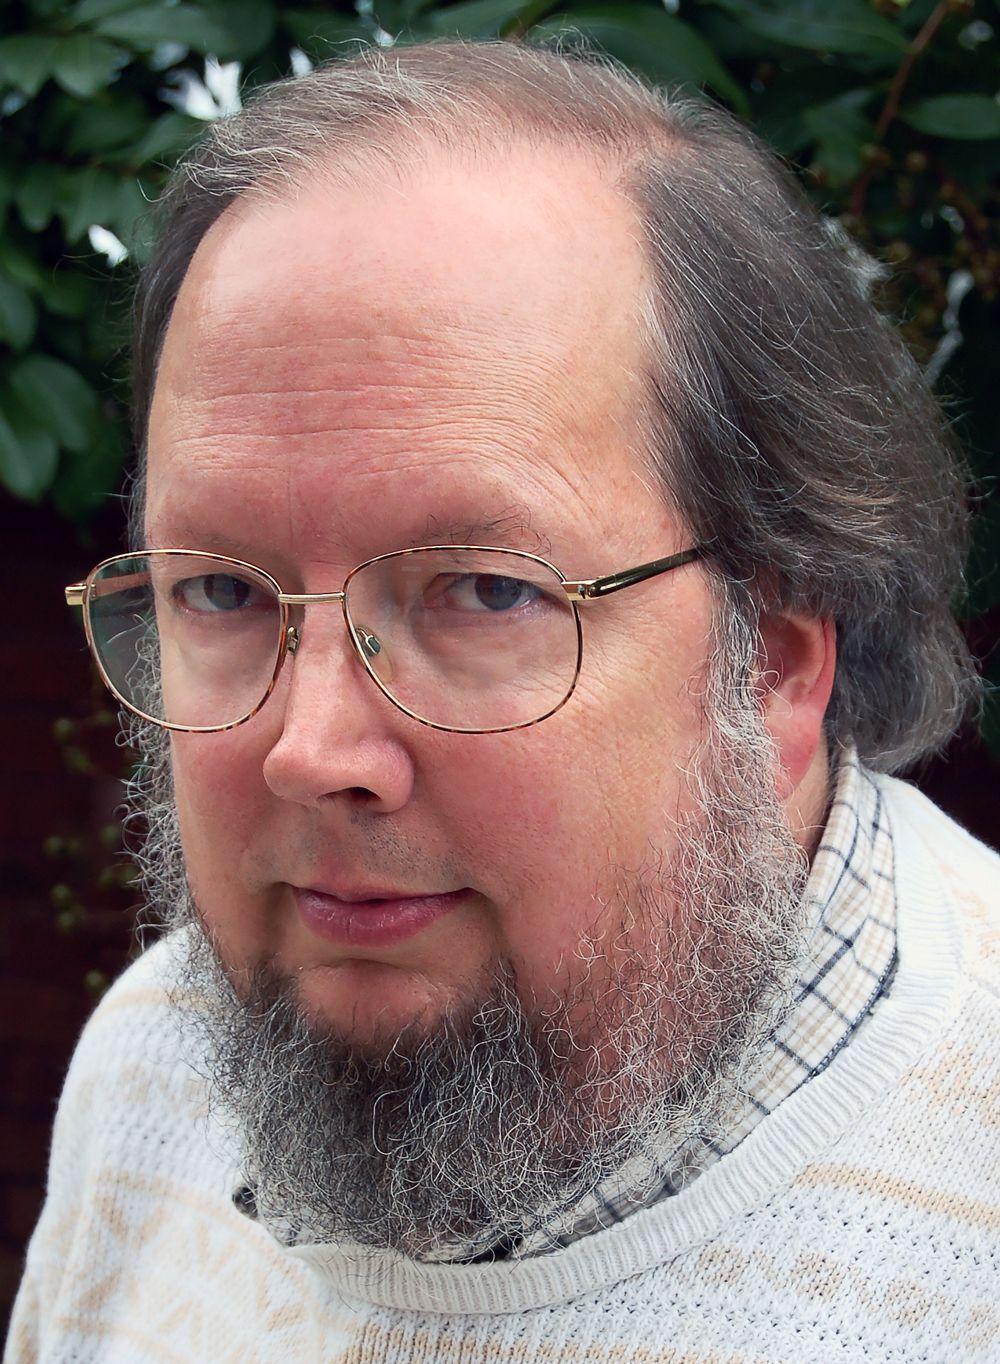 Terry Mattingly